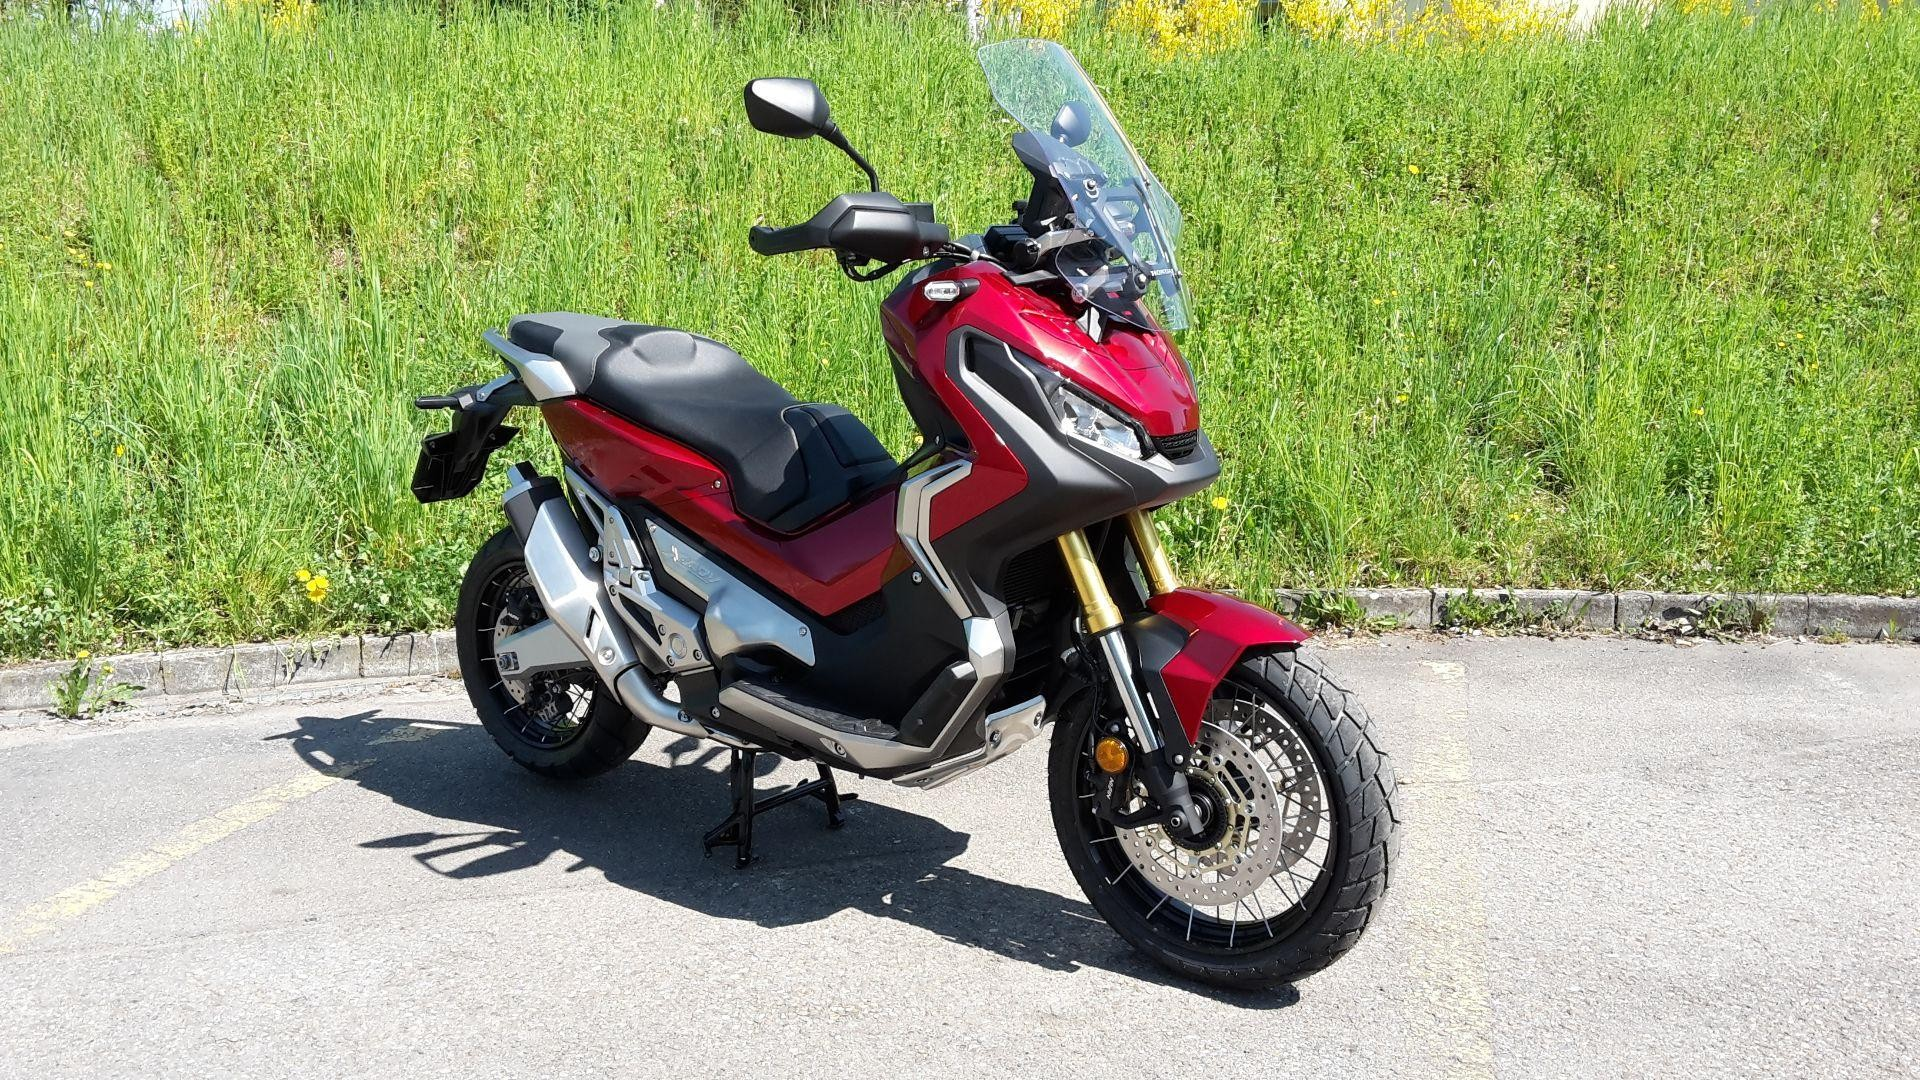 buy motorbike new vehicle bike honda x adv 750 adventure. Black Bedroom Furniture Sets. Home Design Ideas